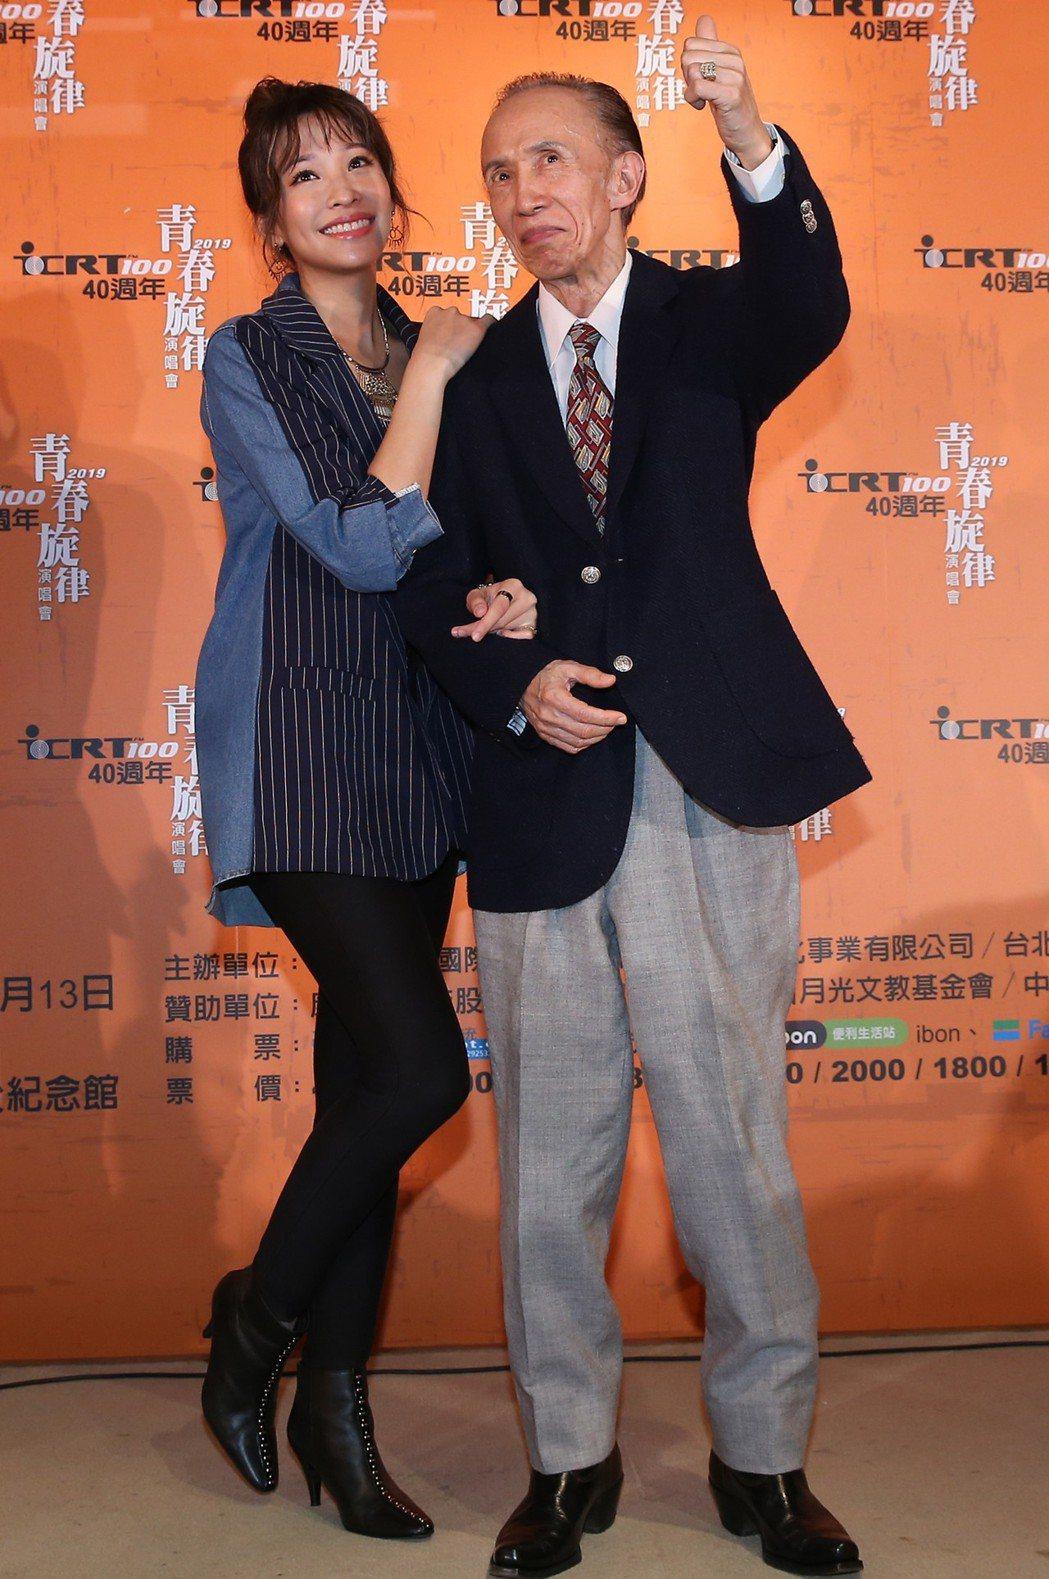 ICRT40周年暨青春旋律演唱會,邀請袁詠琳(左)、徐慶復(右)等。記者曾學仁/...